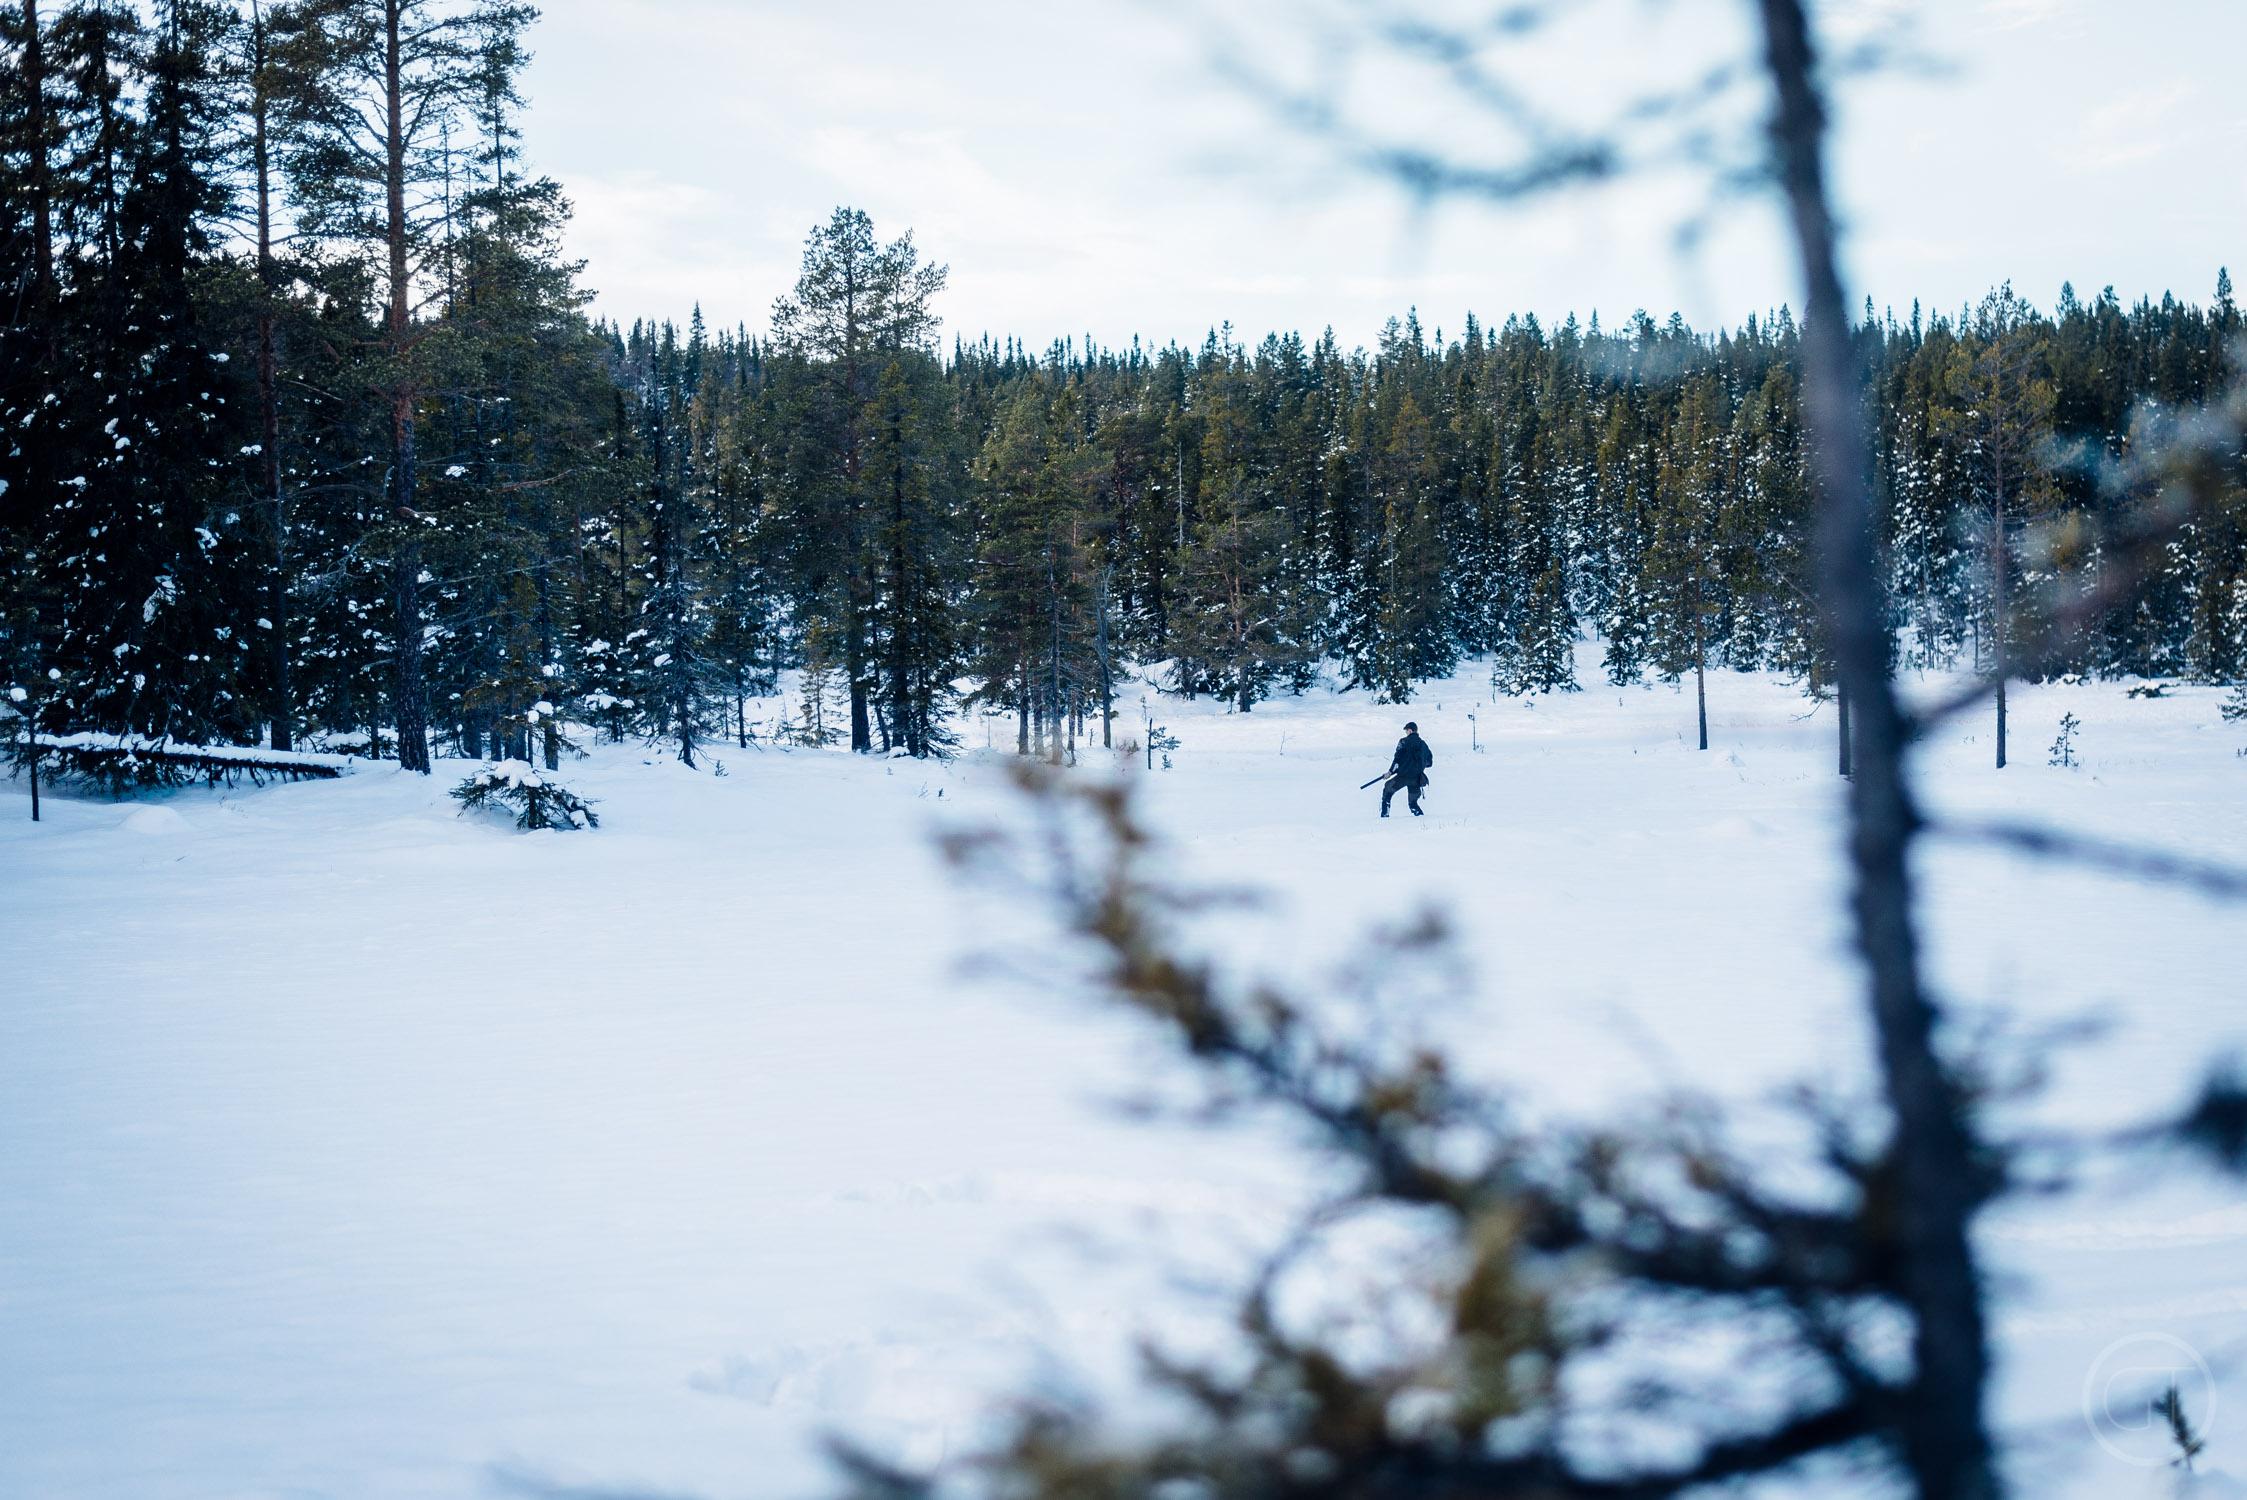 GUSTAV_THUESEN_HUNTING_NORWAY_OUTDOOR_LIFESTYLE_PHOTOGRAPHER_PROFESSIONAL-7.jpg